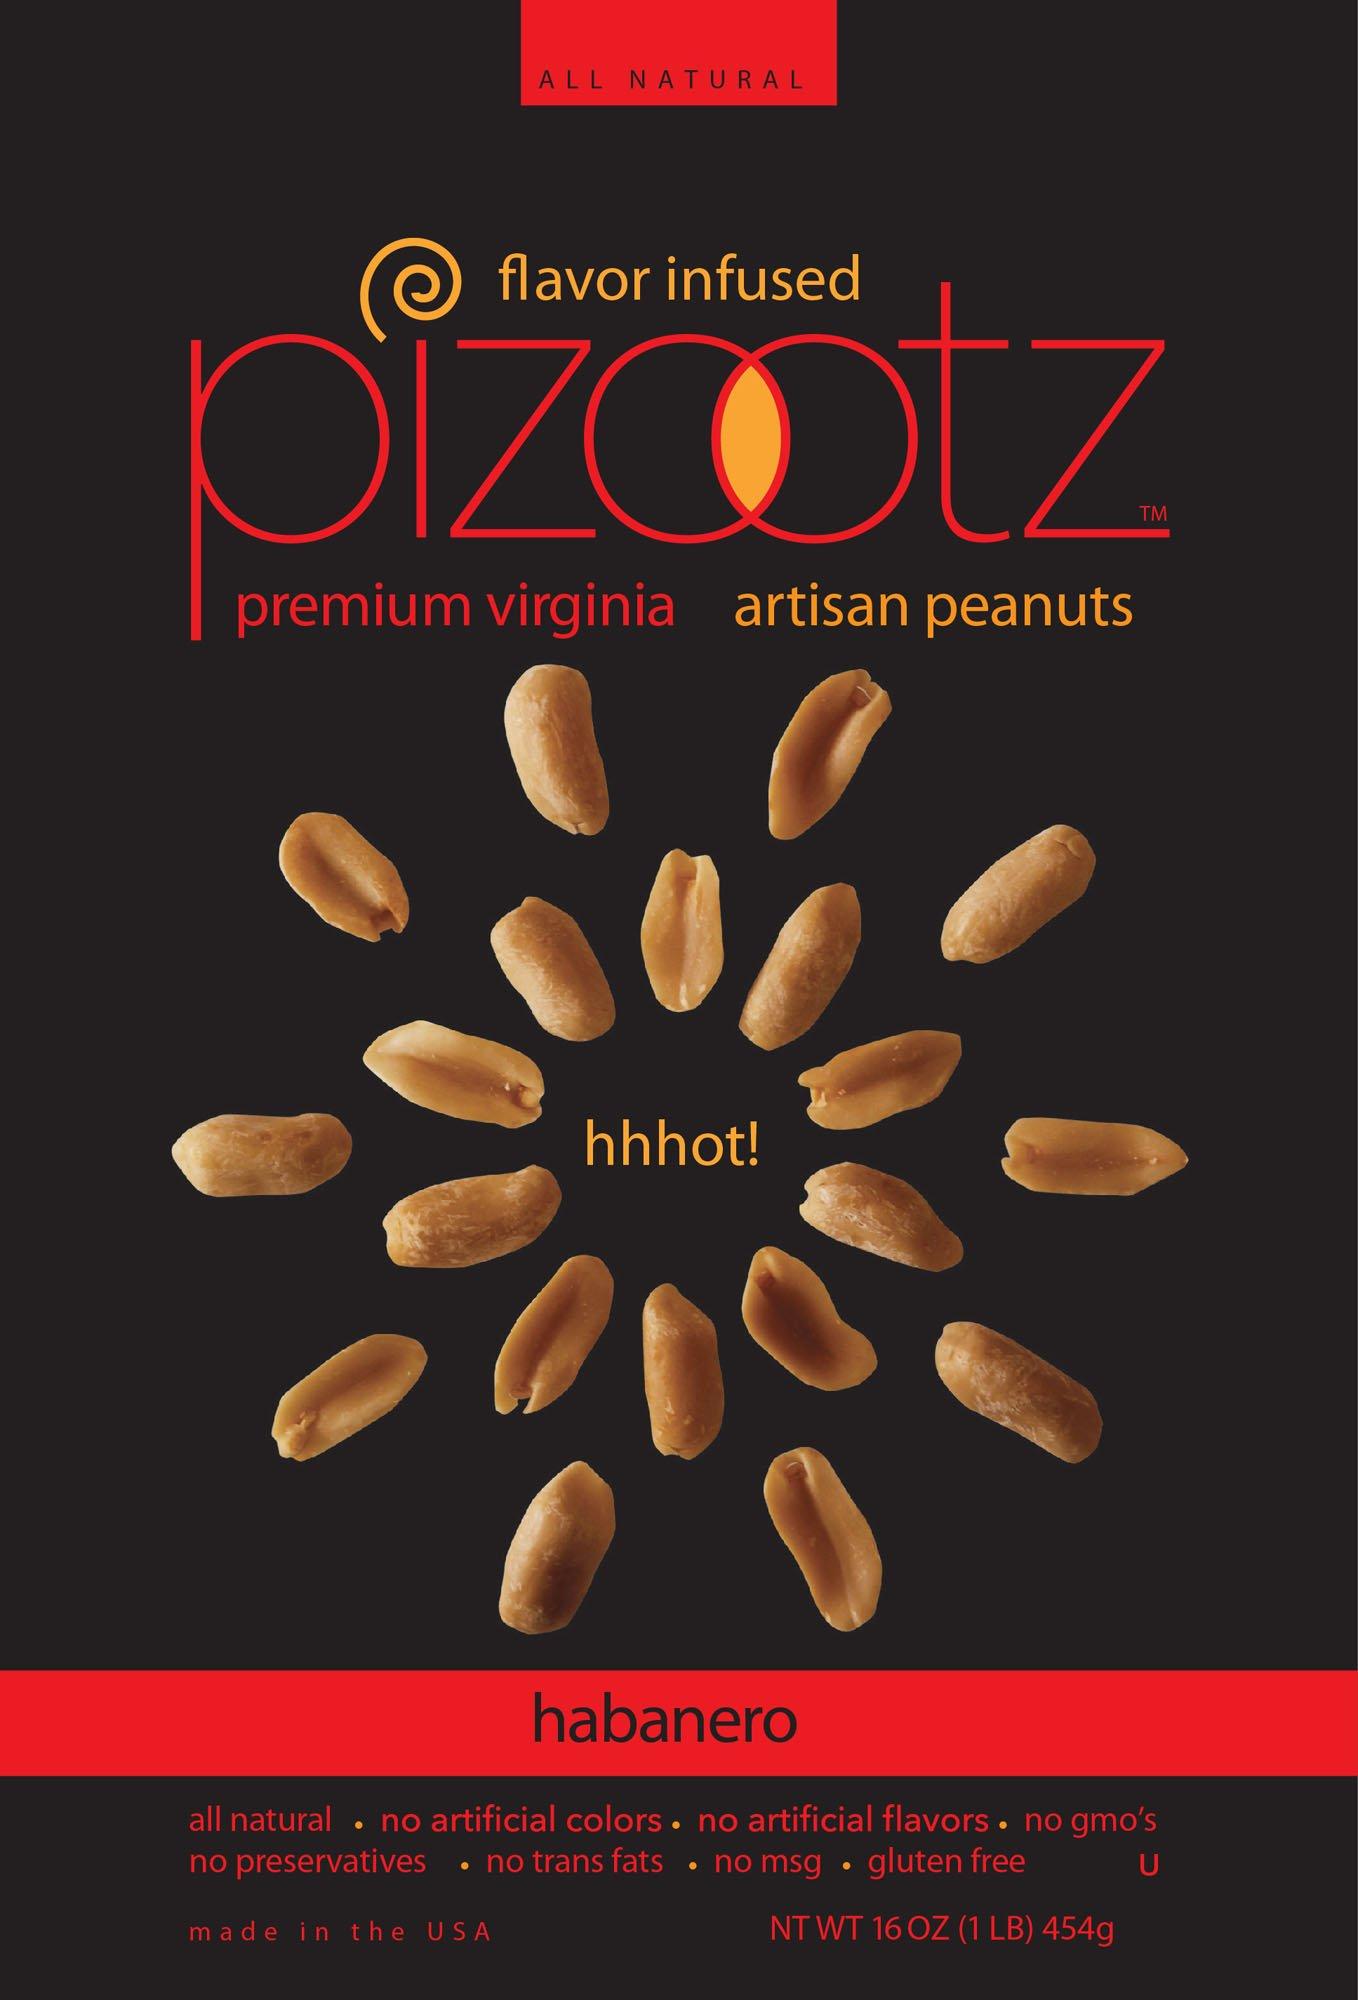 PIZOOTZ Habanero Flavor Infused Peanuts, Premium Virginia Gourmet, 16 Ounce